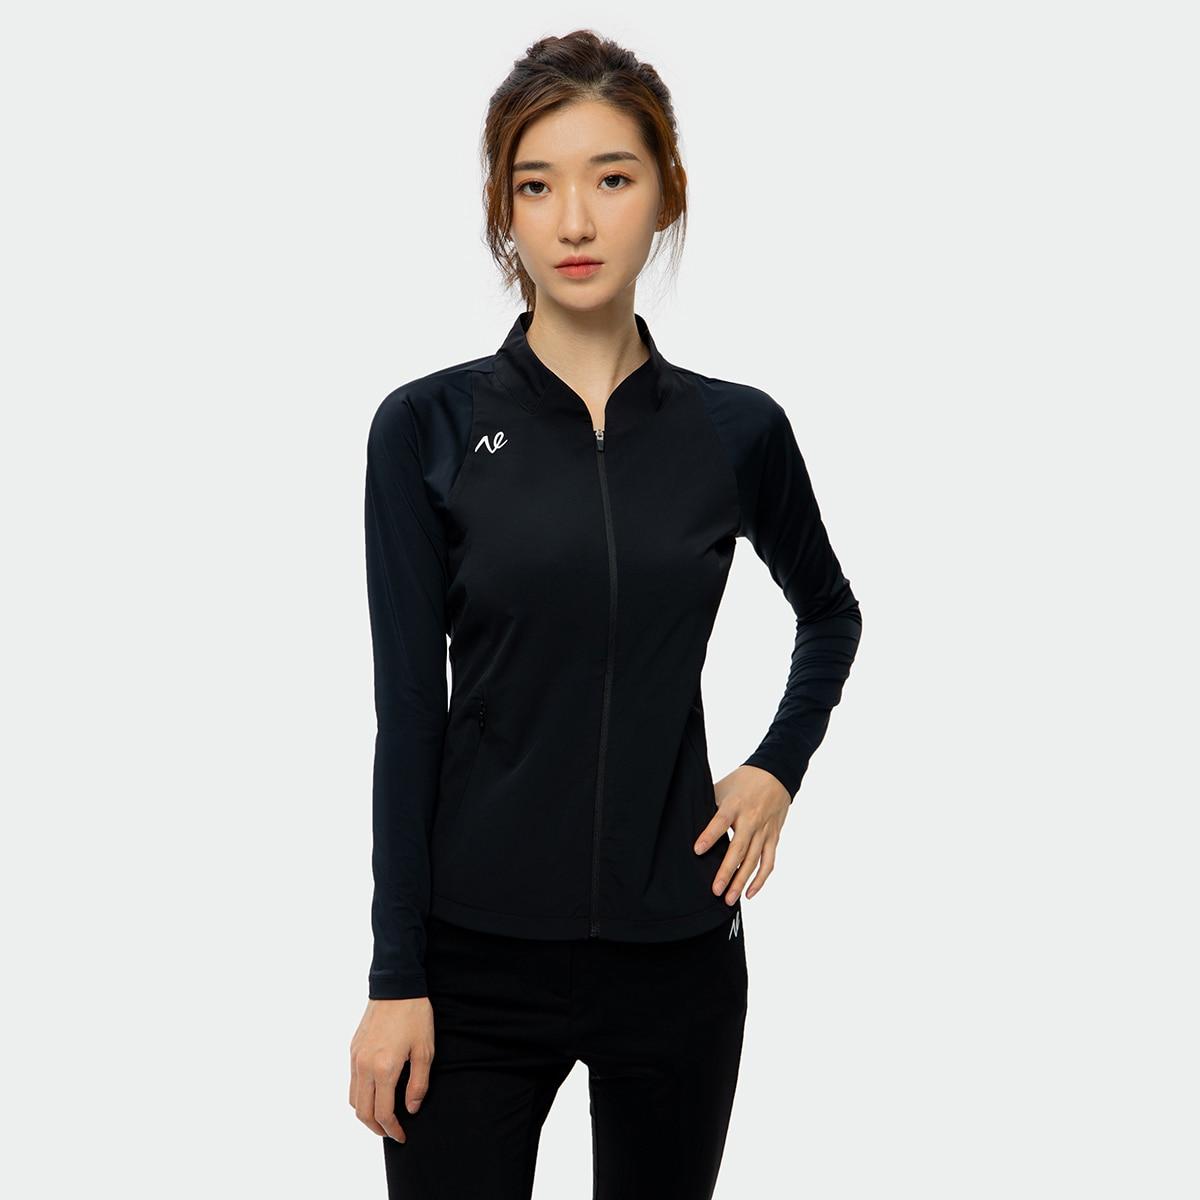 2021 Golf Jacket Ladies, Windproof Jacket Women's Golf Wear Outdoor Sports Running Clothes Stand up Collar Golf Jacket Ladies